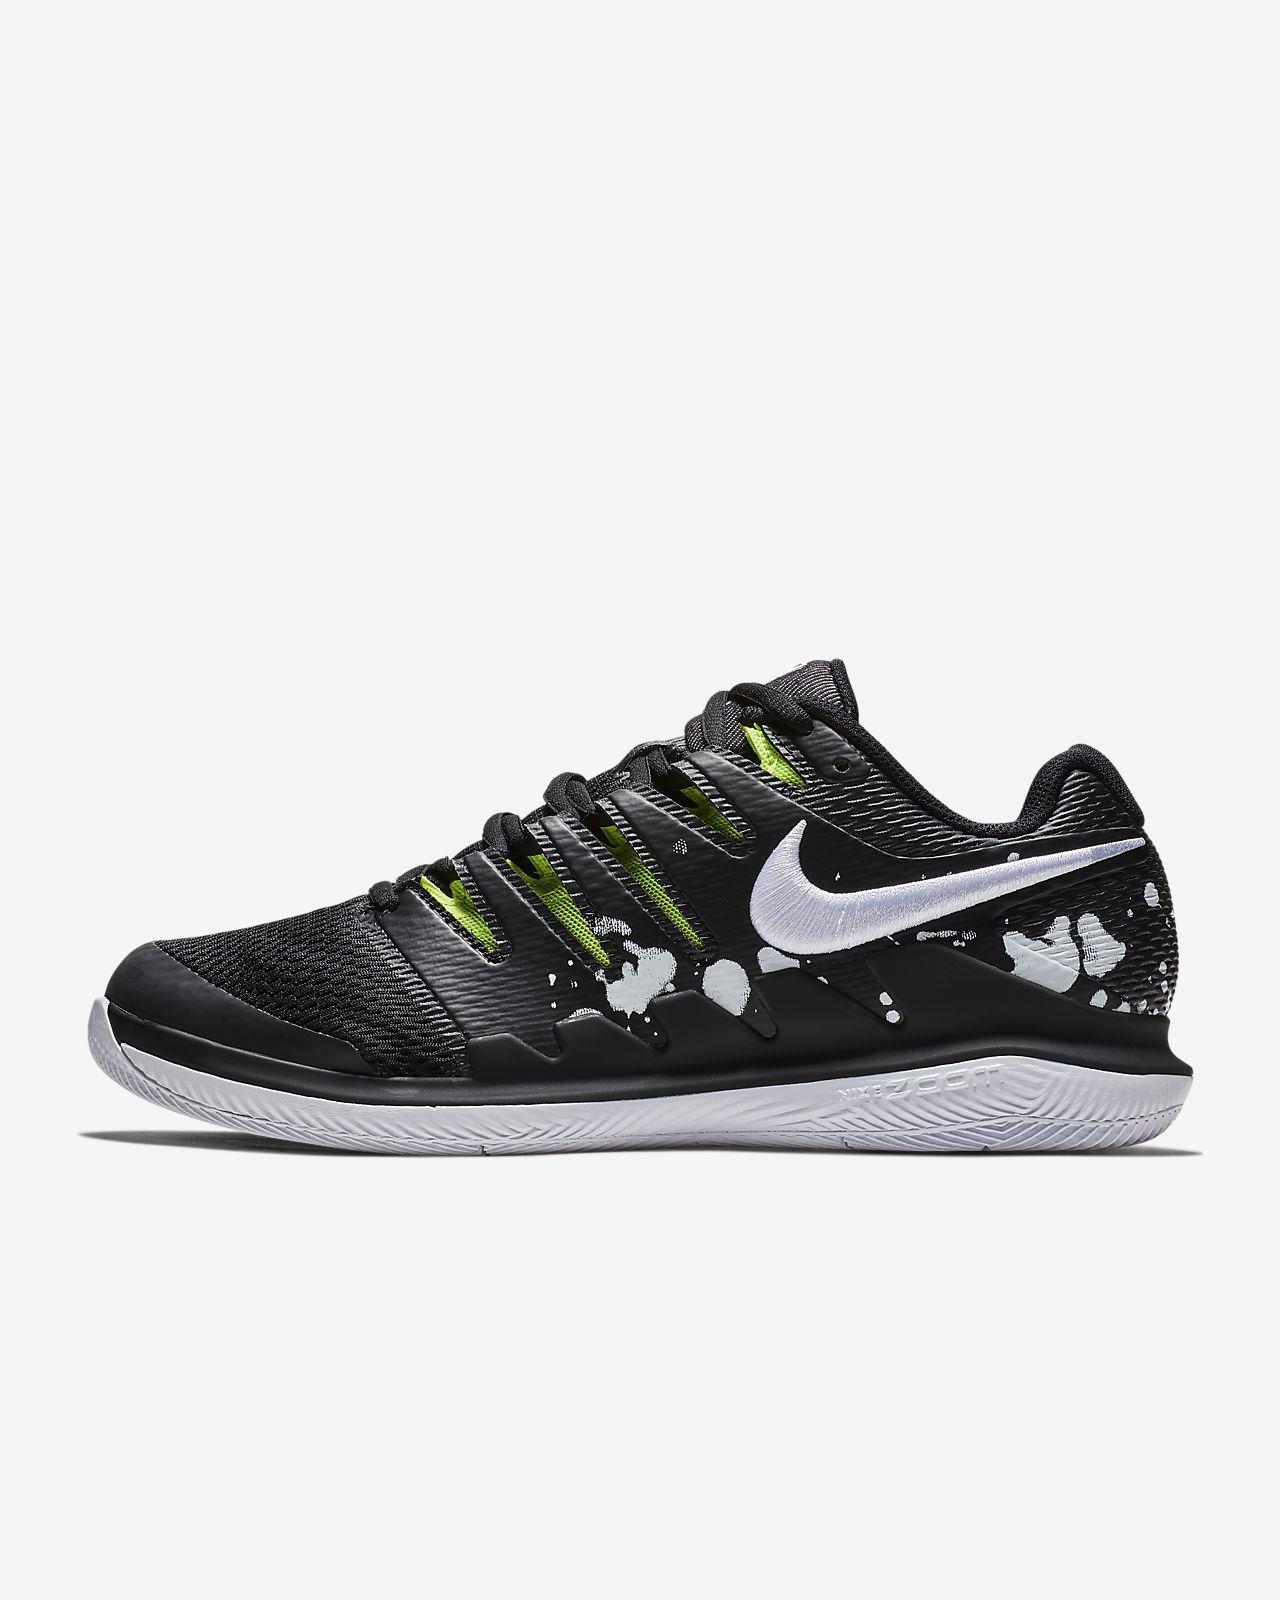 127ba250a8d ... NikeCourt Air Zoom Vapor X Premium Hard Court Zapatillas de tenis -  Hombre